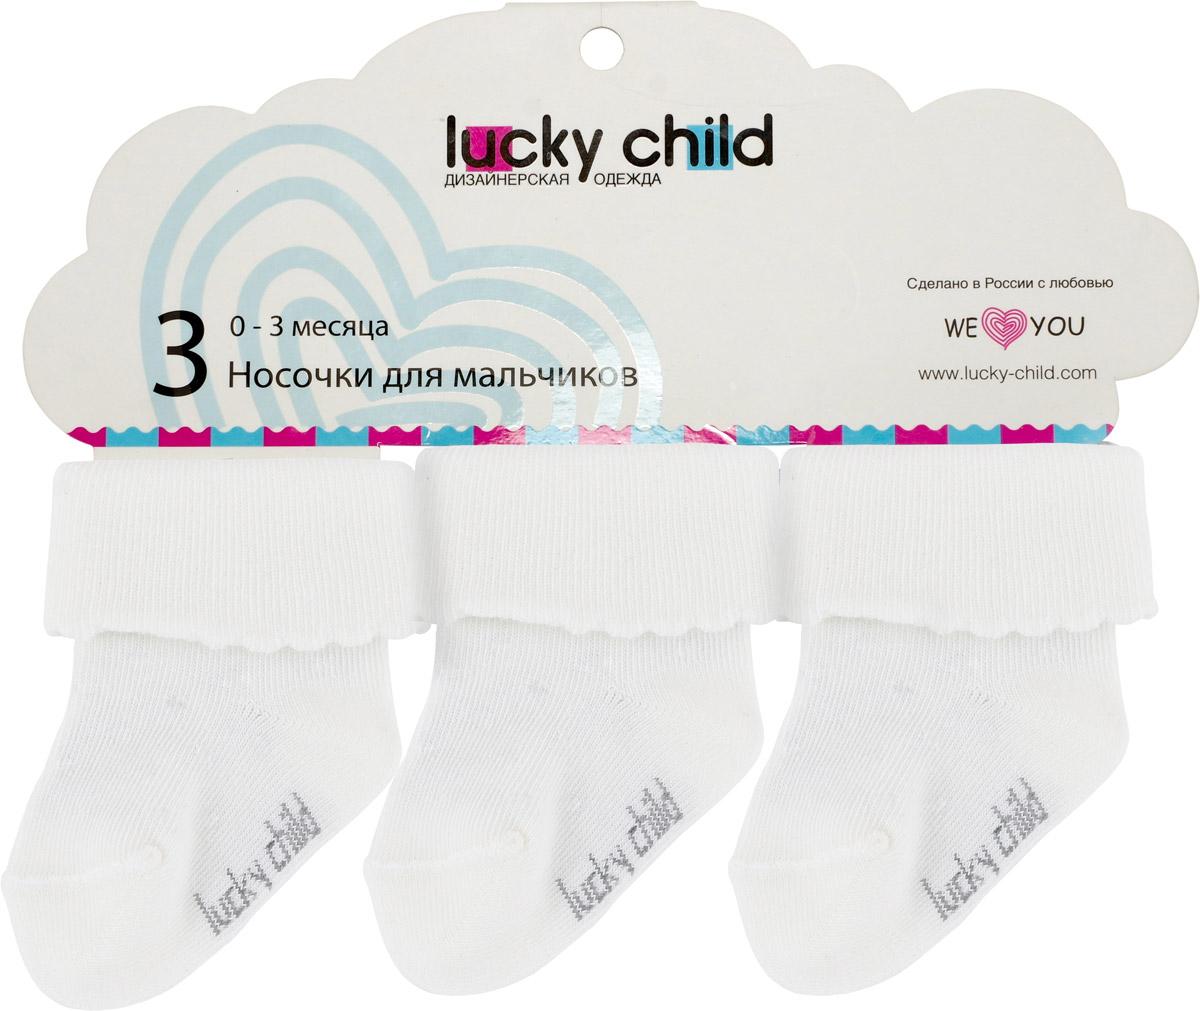 Носки для мальчика Lucky Child, цвет: молочный. Н-2М. Размер 13/15, 3 пары футболка для мальчика lucky child цвет сине зеленый молочный 21 262 размер 98 104